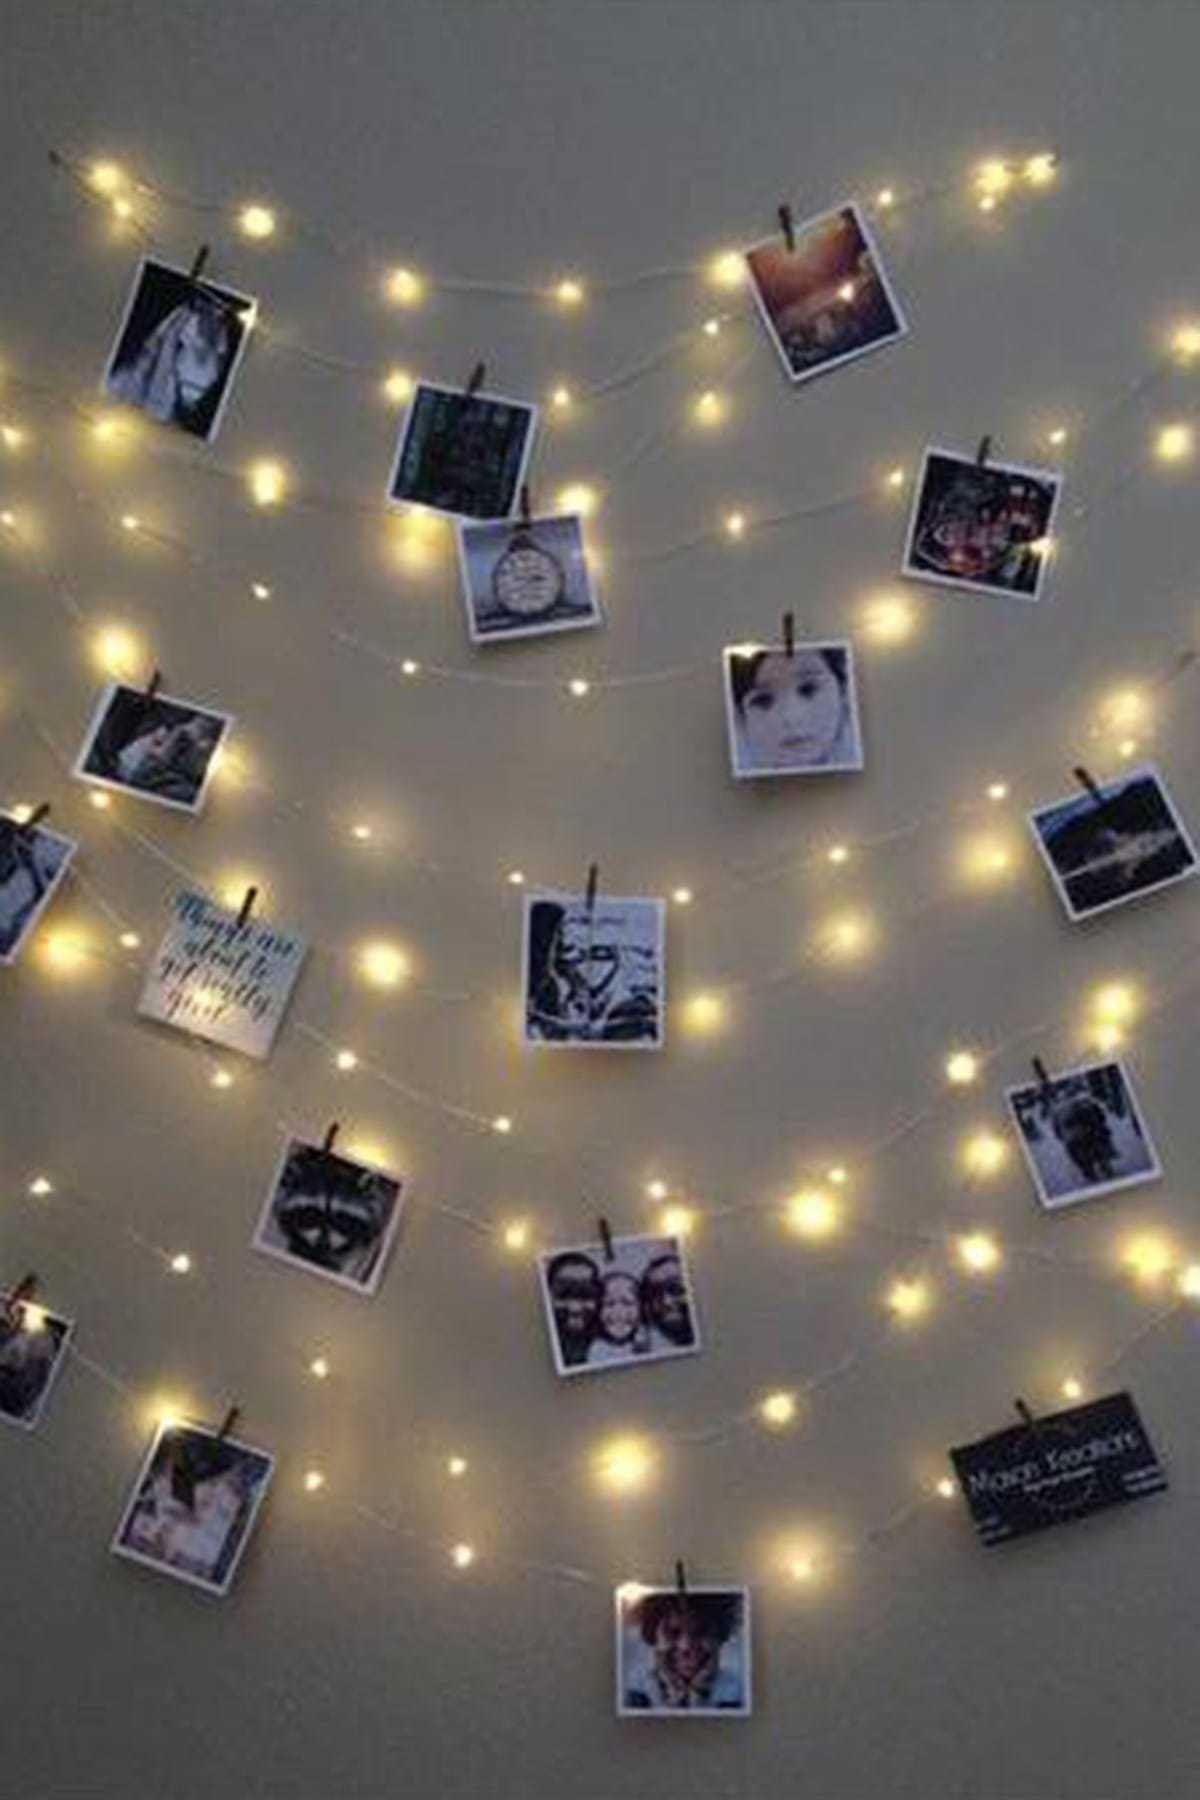 Parti dolabı 3 Metre Peri Led Işık 15 Adet Küçük Mandal Fotoğraf Asma Seti Anı Duvarı Set